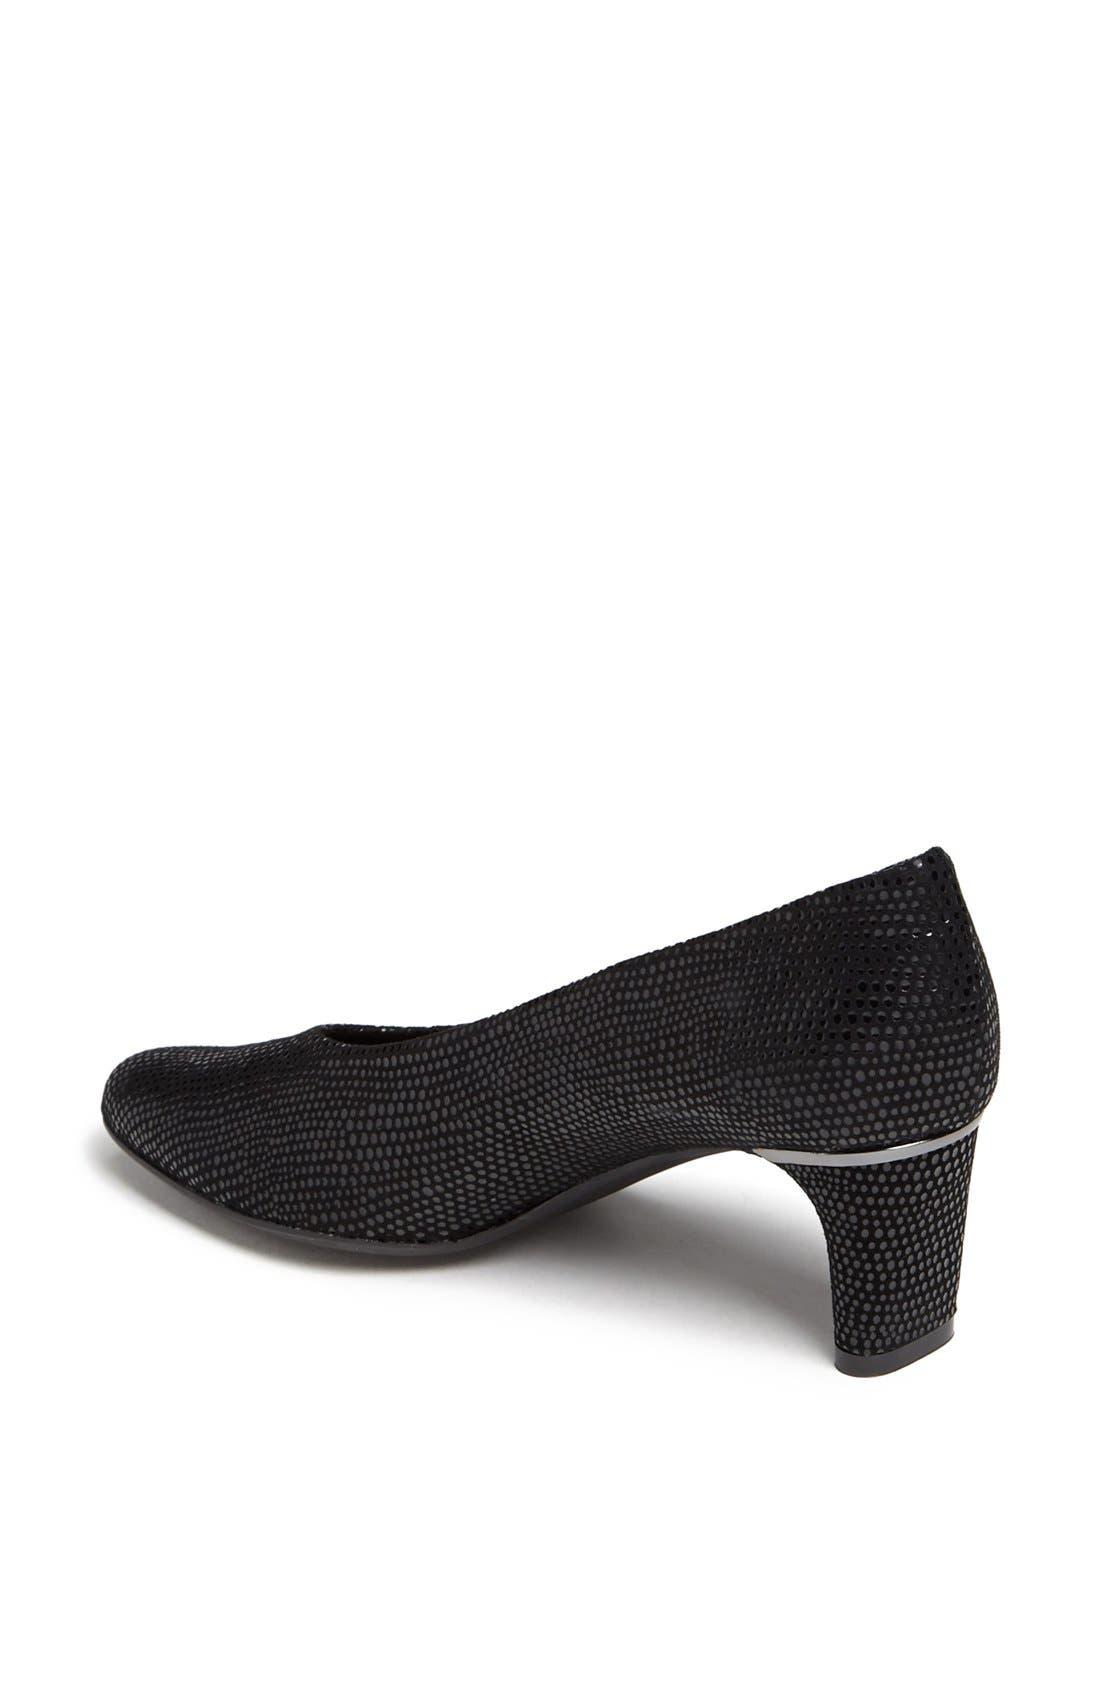 5c0c4af58cea3 Women's Vaneli Shoes   Nordstrom